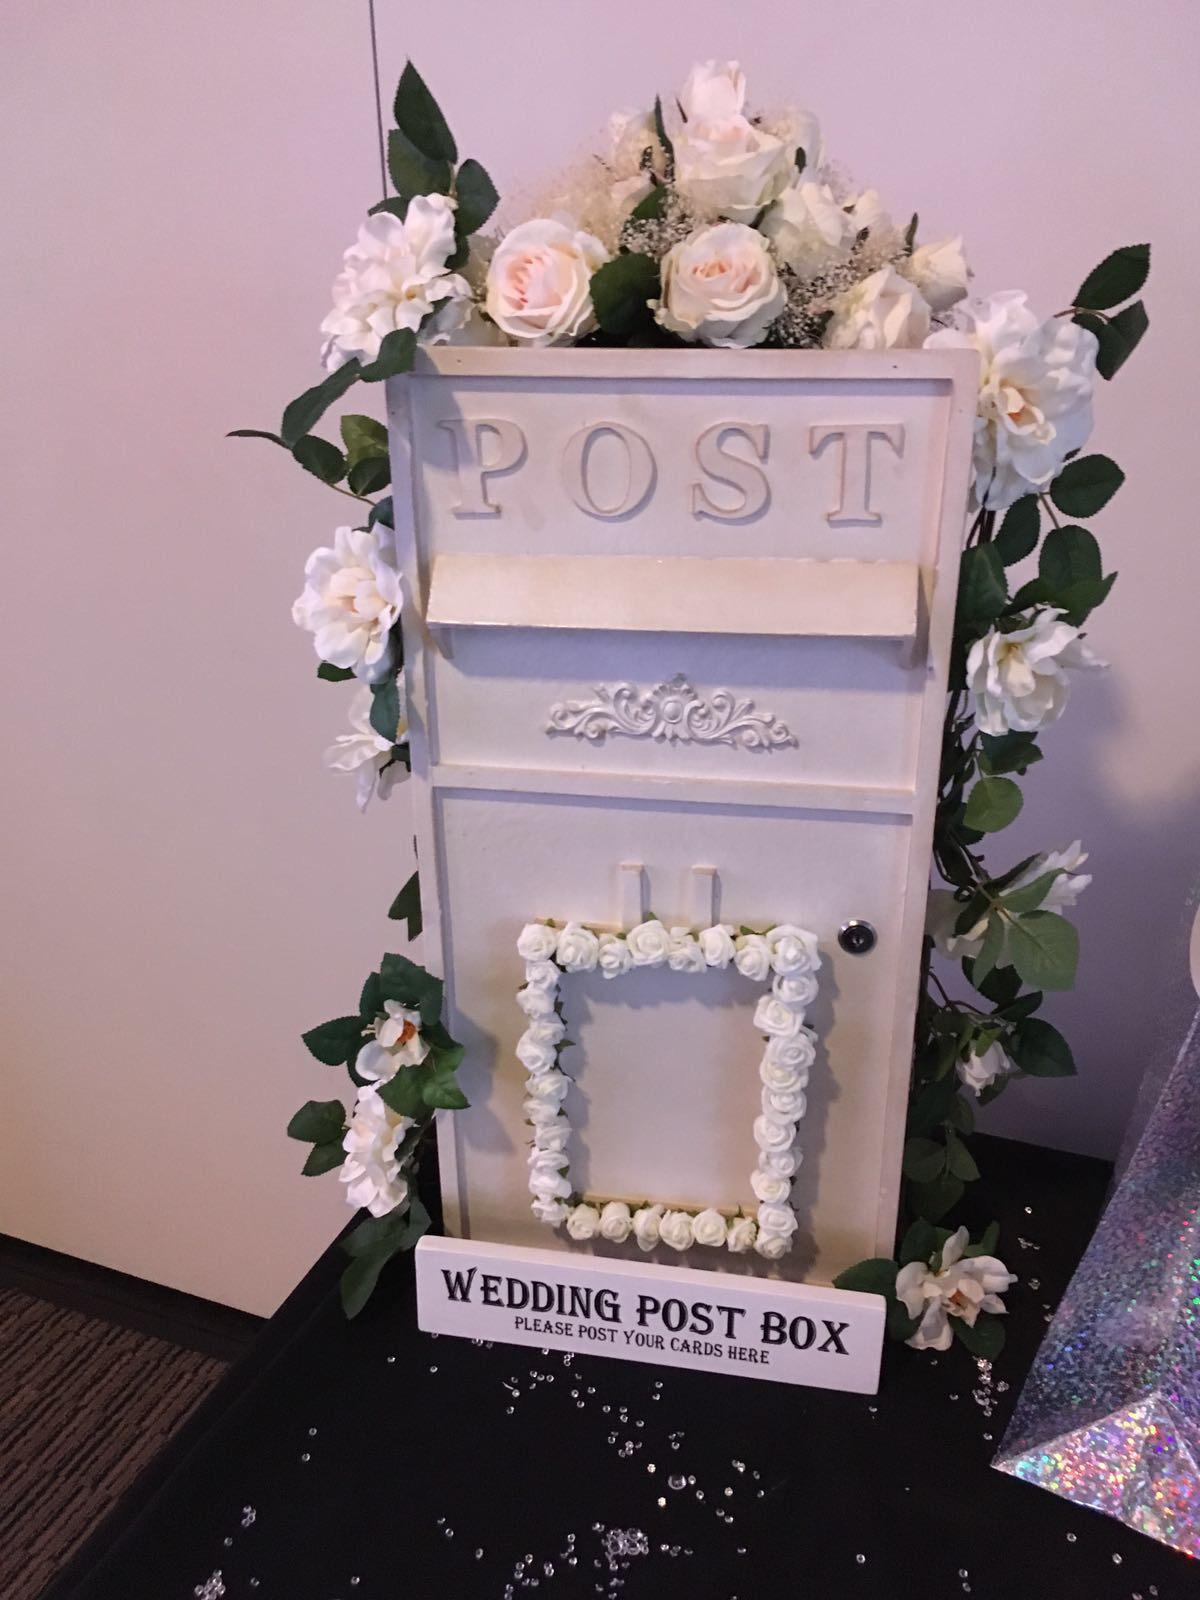 Wedding post box - Hire